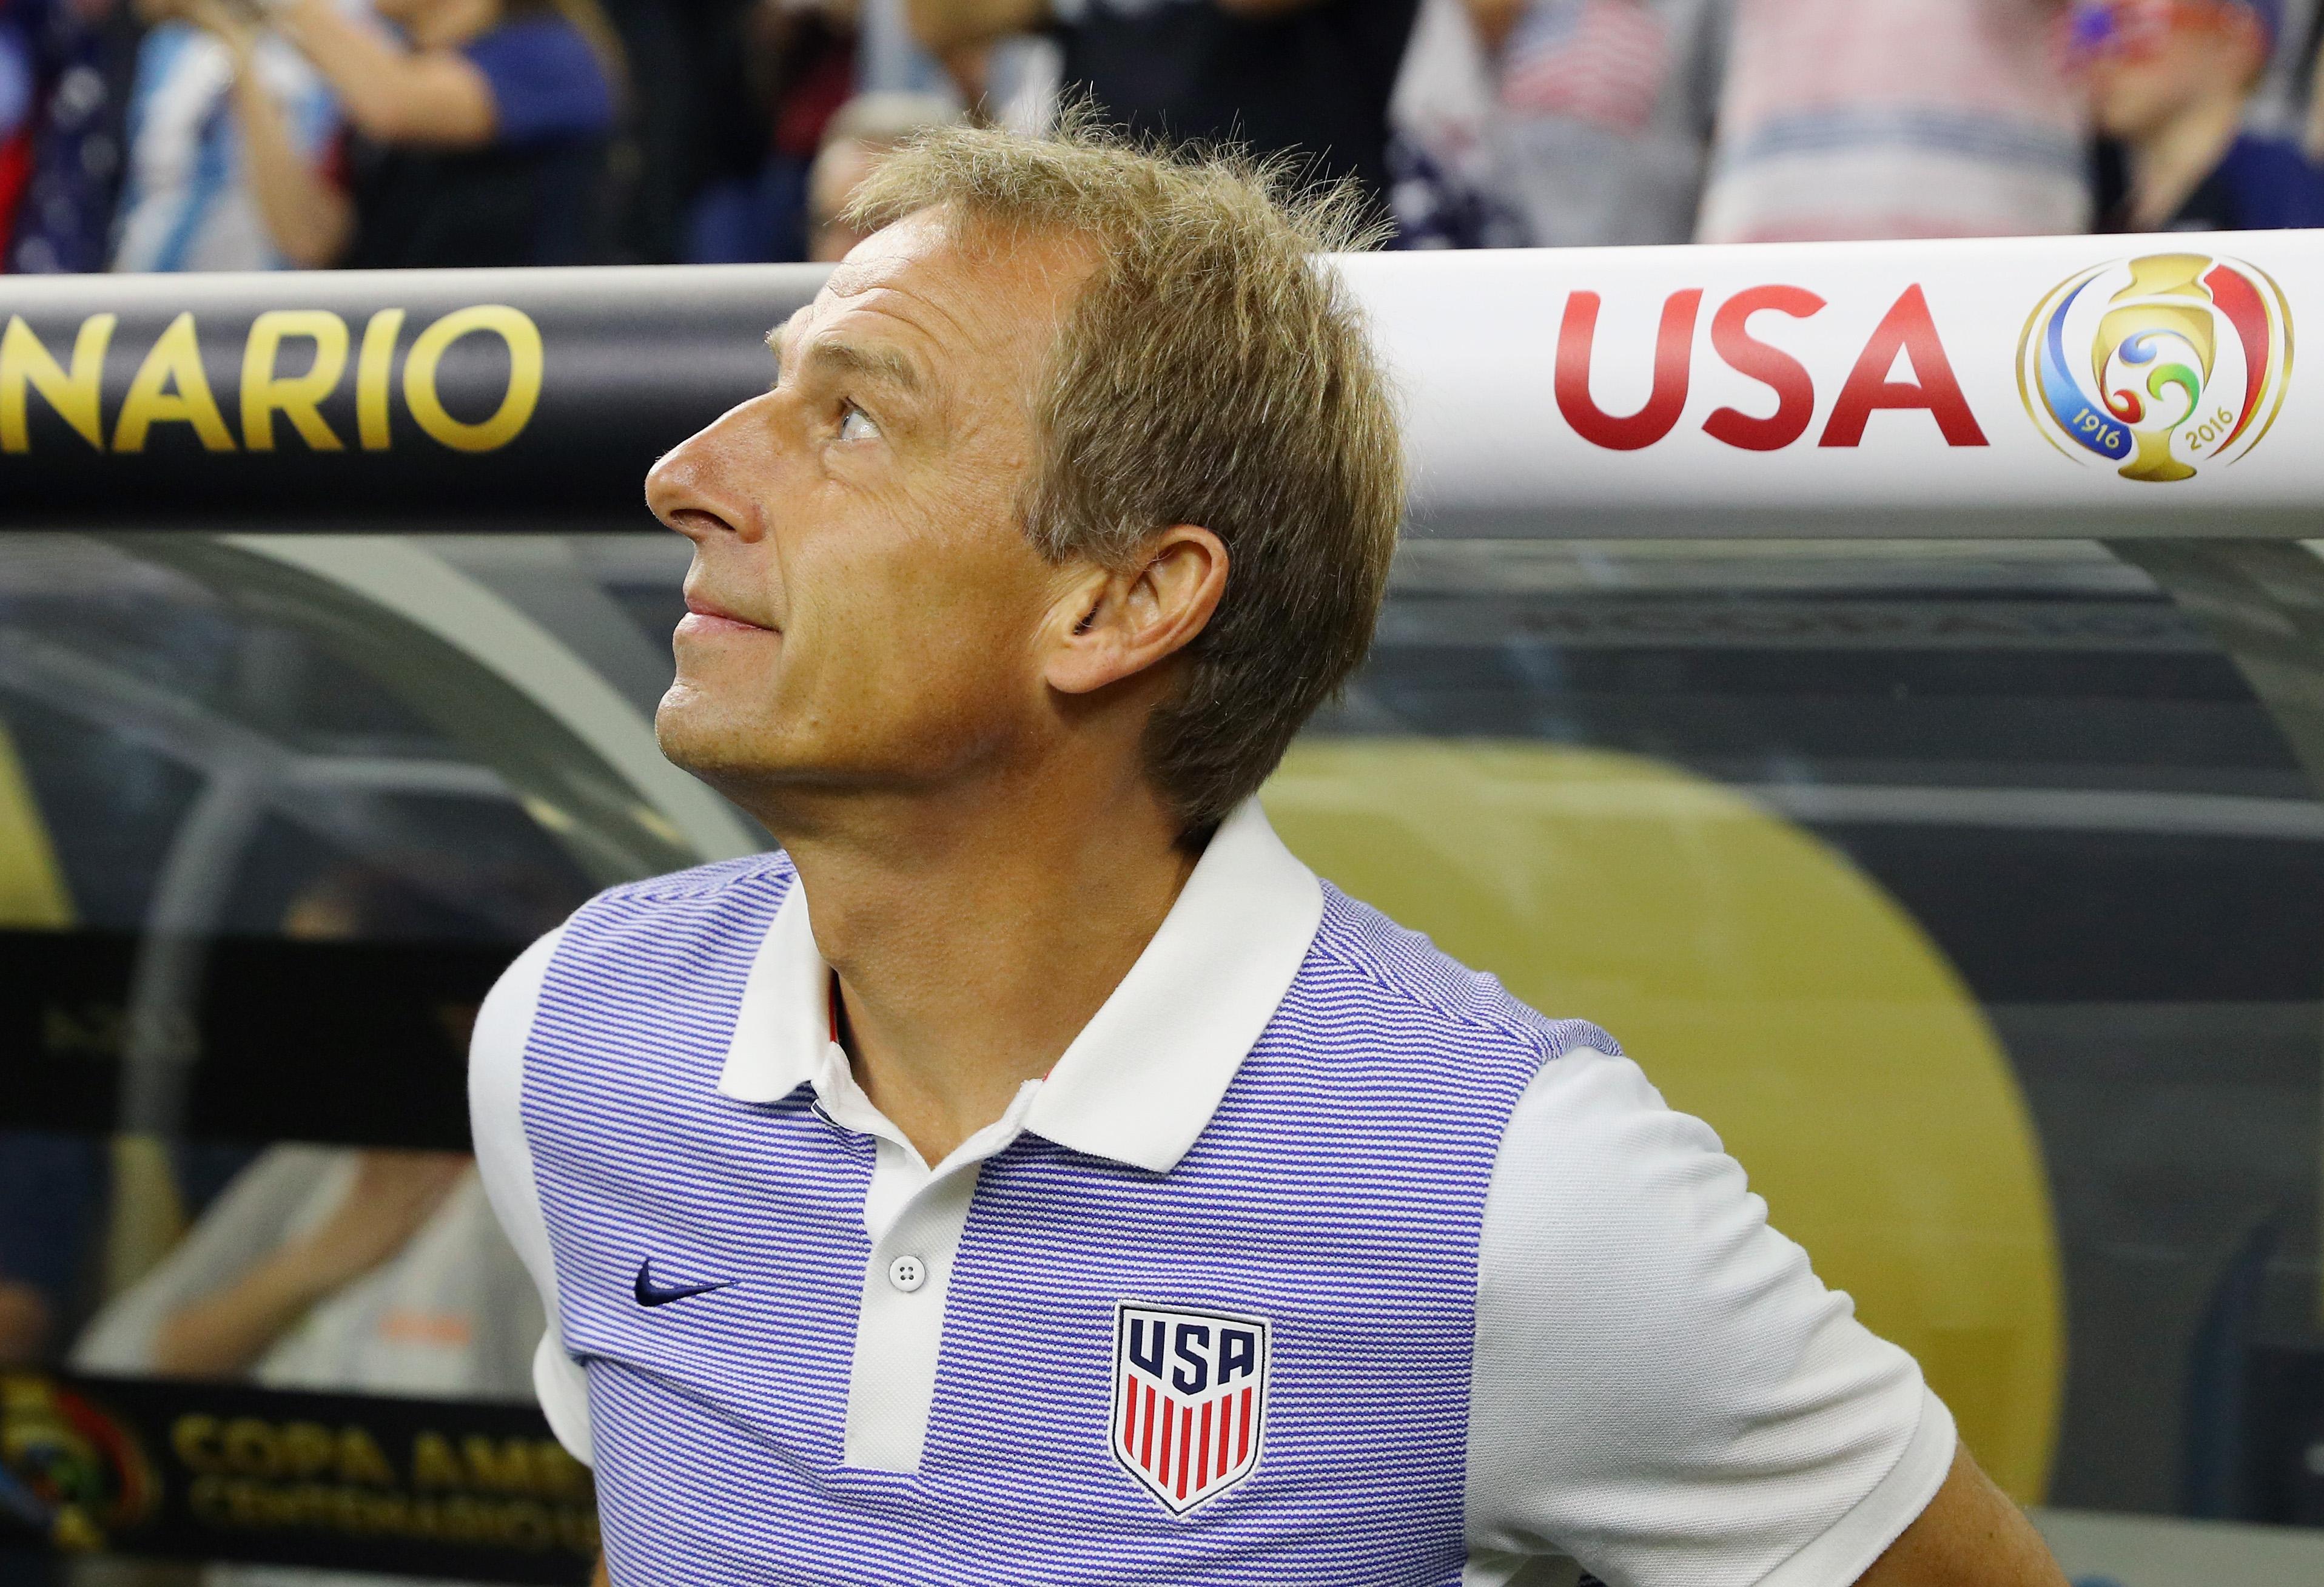 Jürgen Klinsmann, Entrenador, Alemán, Salario millonario, 3.3 millones de dólares, Selección, Estados Unidos, Eliminado, Mundial, Rusia 2018